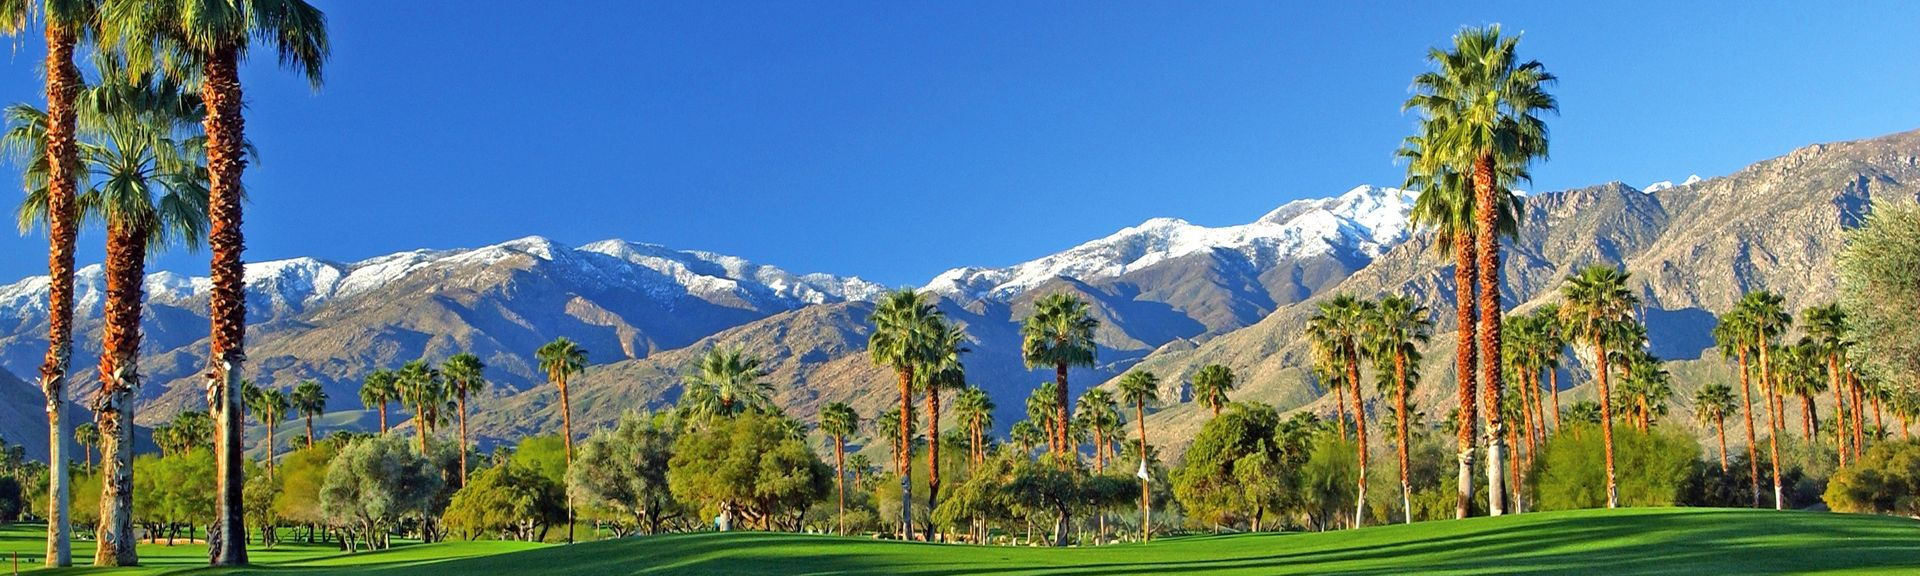 Desert Park Estates, Palm Springs, California, United States of America